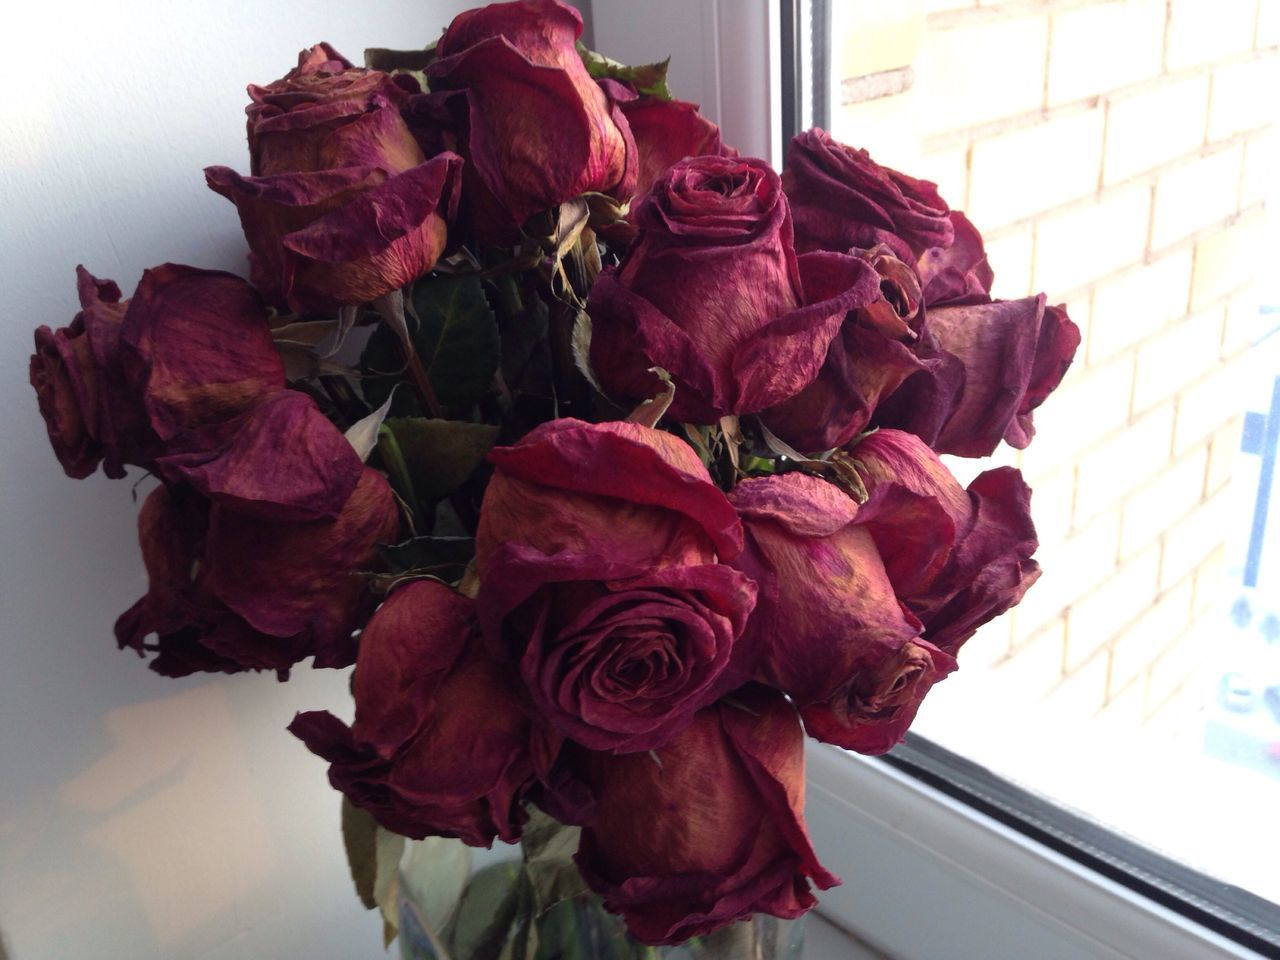 Roses Flower Died Broken Love Lovestory Red Roses